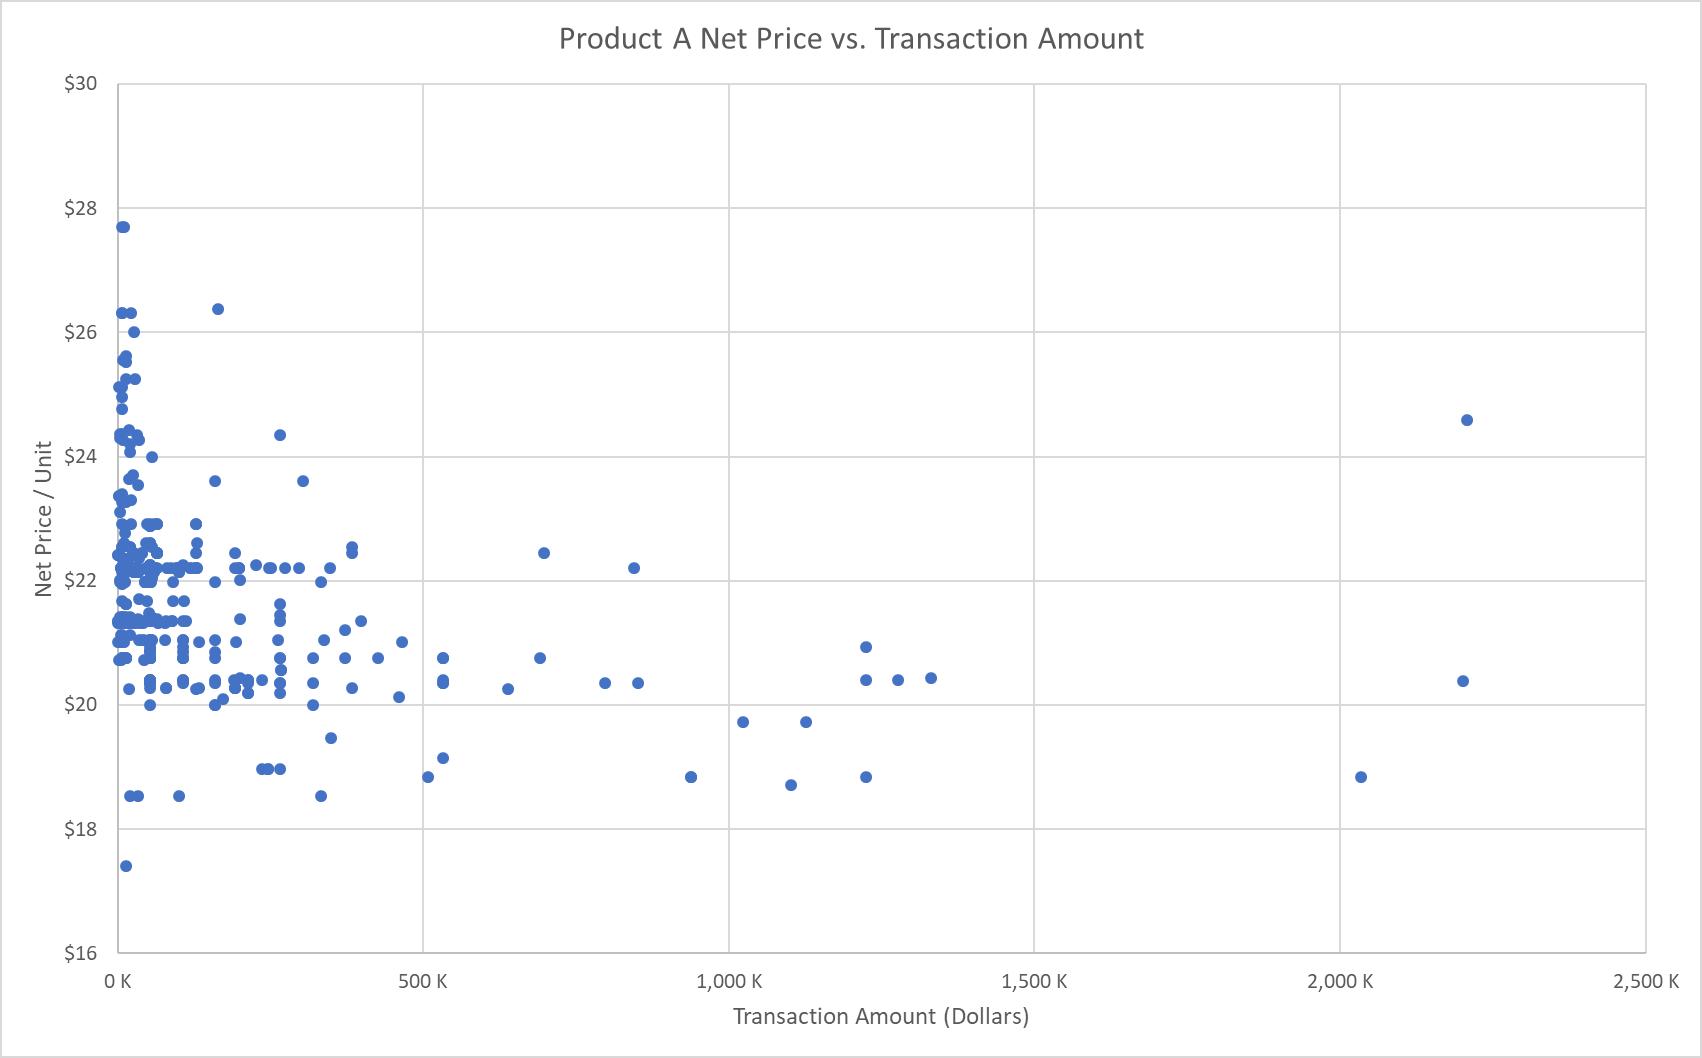 Pricing Analytics: Net Price vs. Transaction Amount